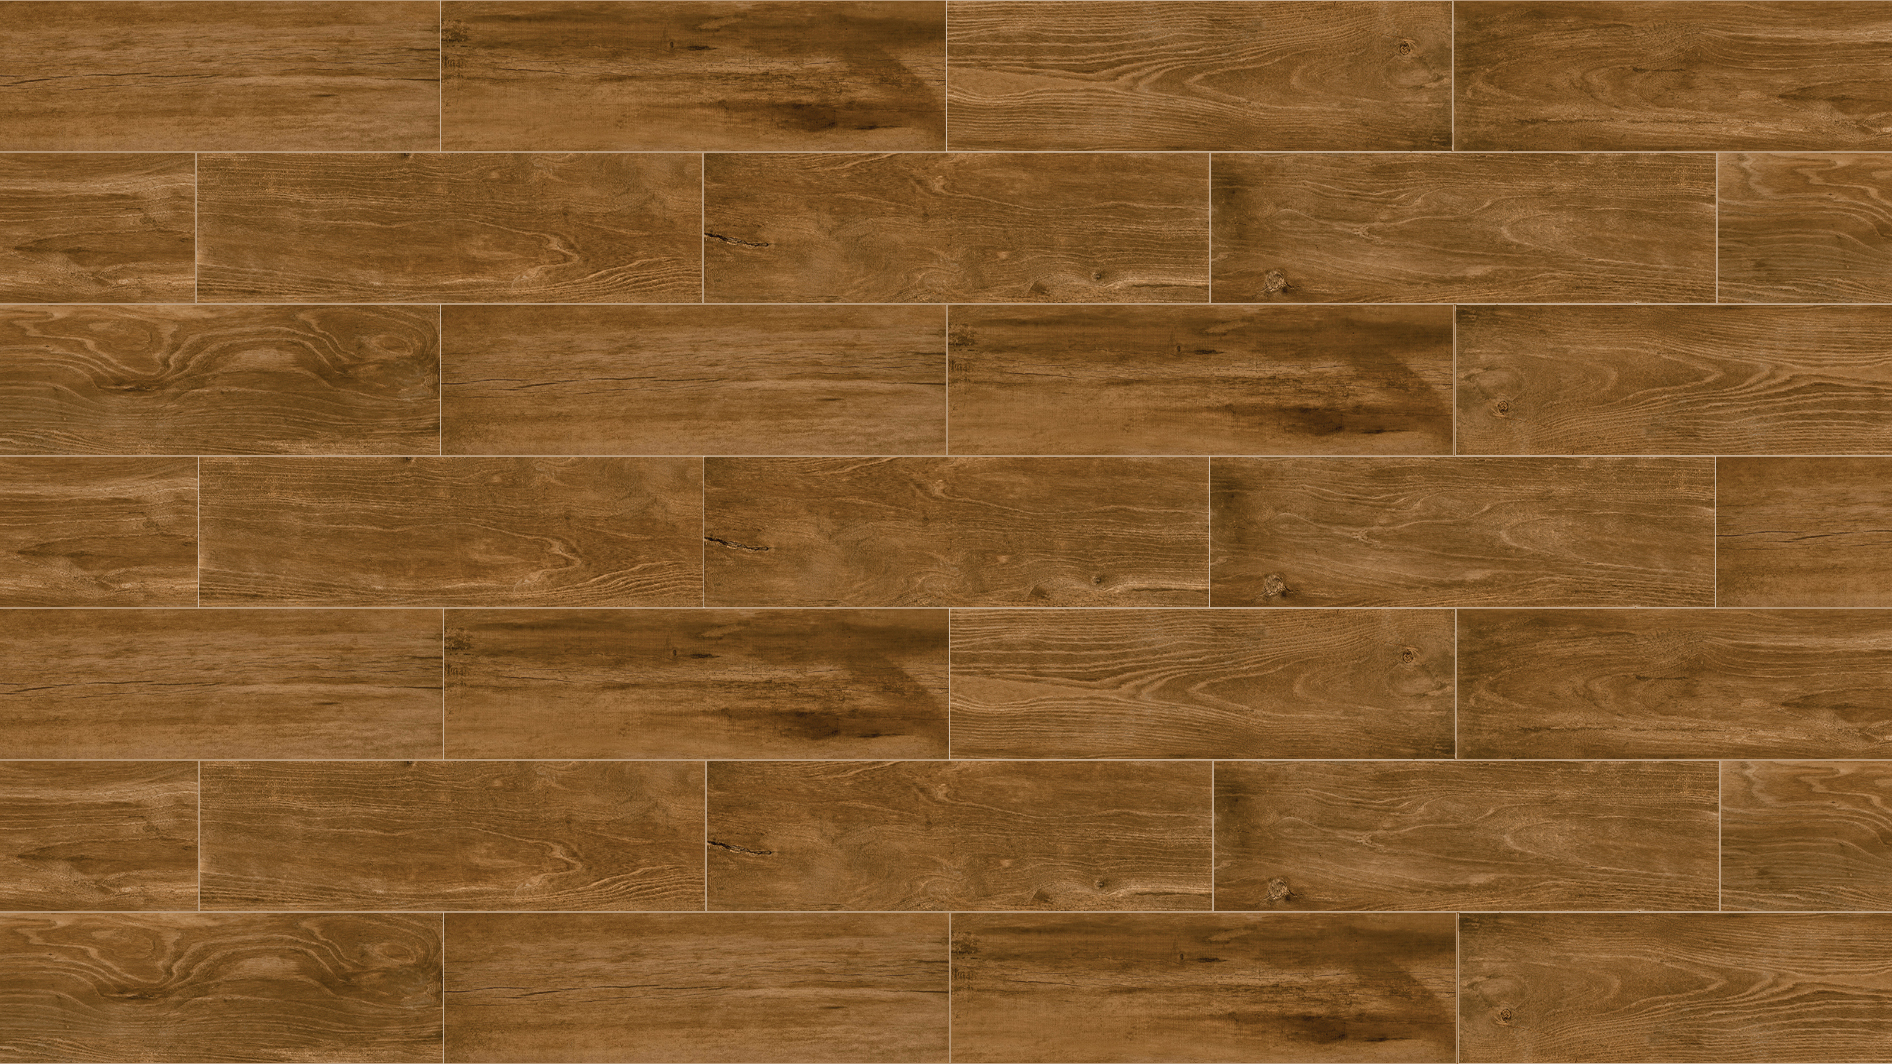 patina blando piso armado